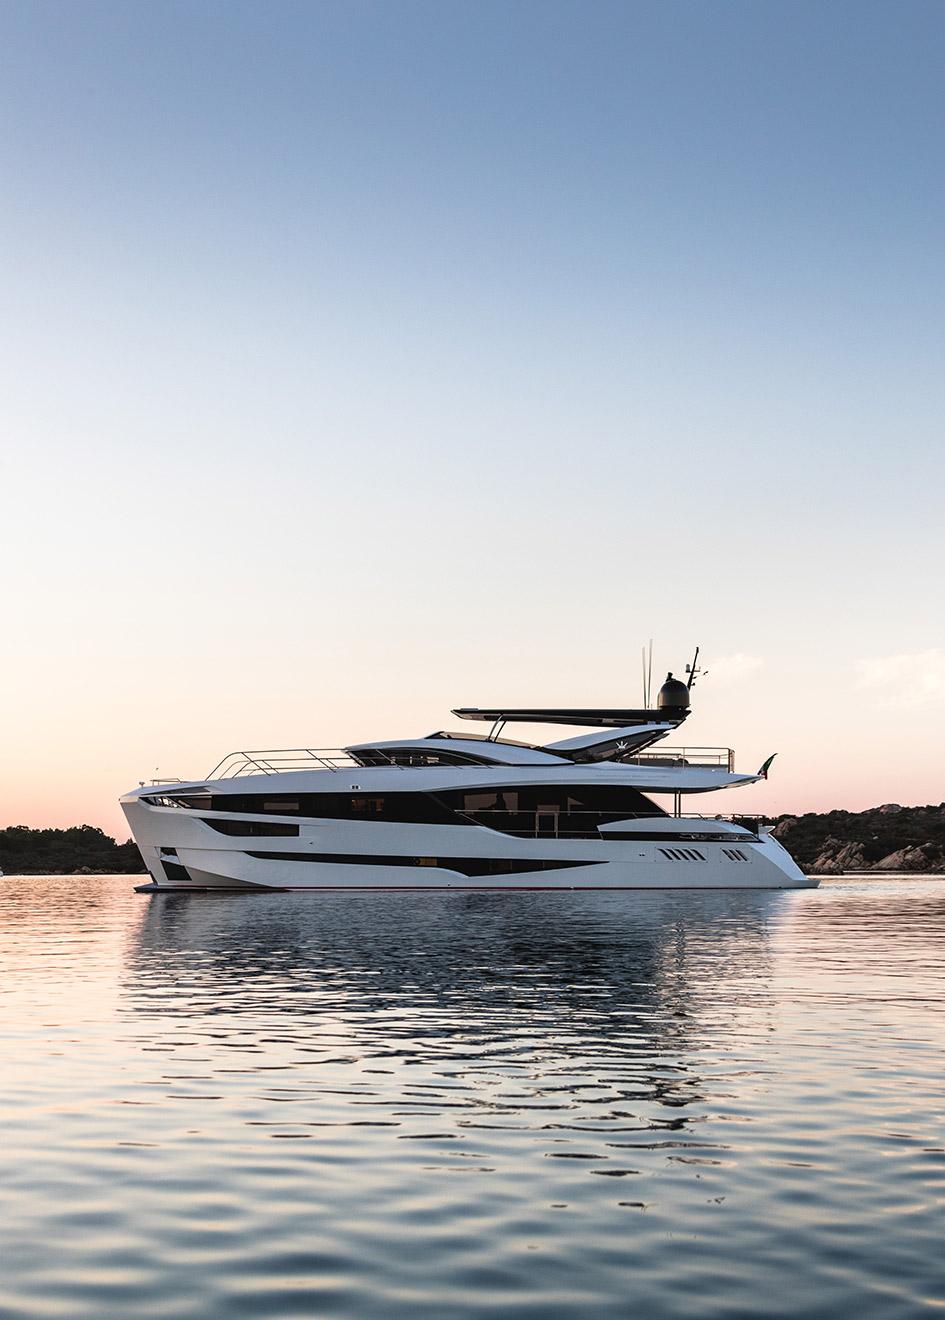 side-view-of-dominator-yacht-kalliente-credit-jeff-brown